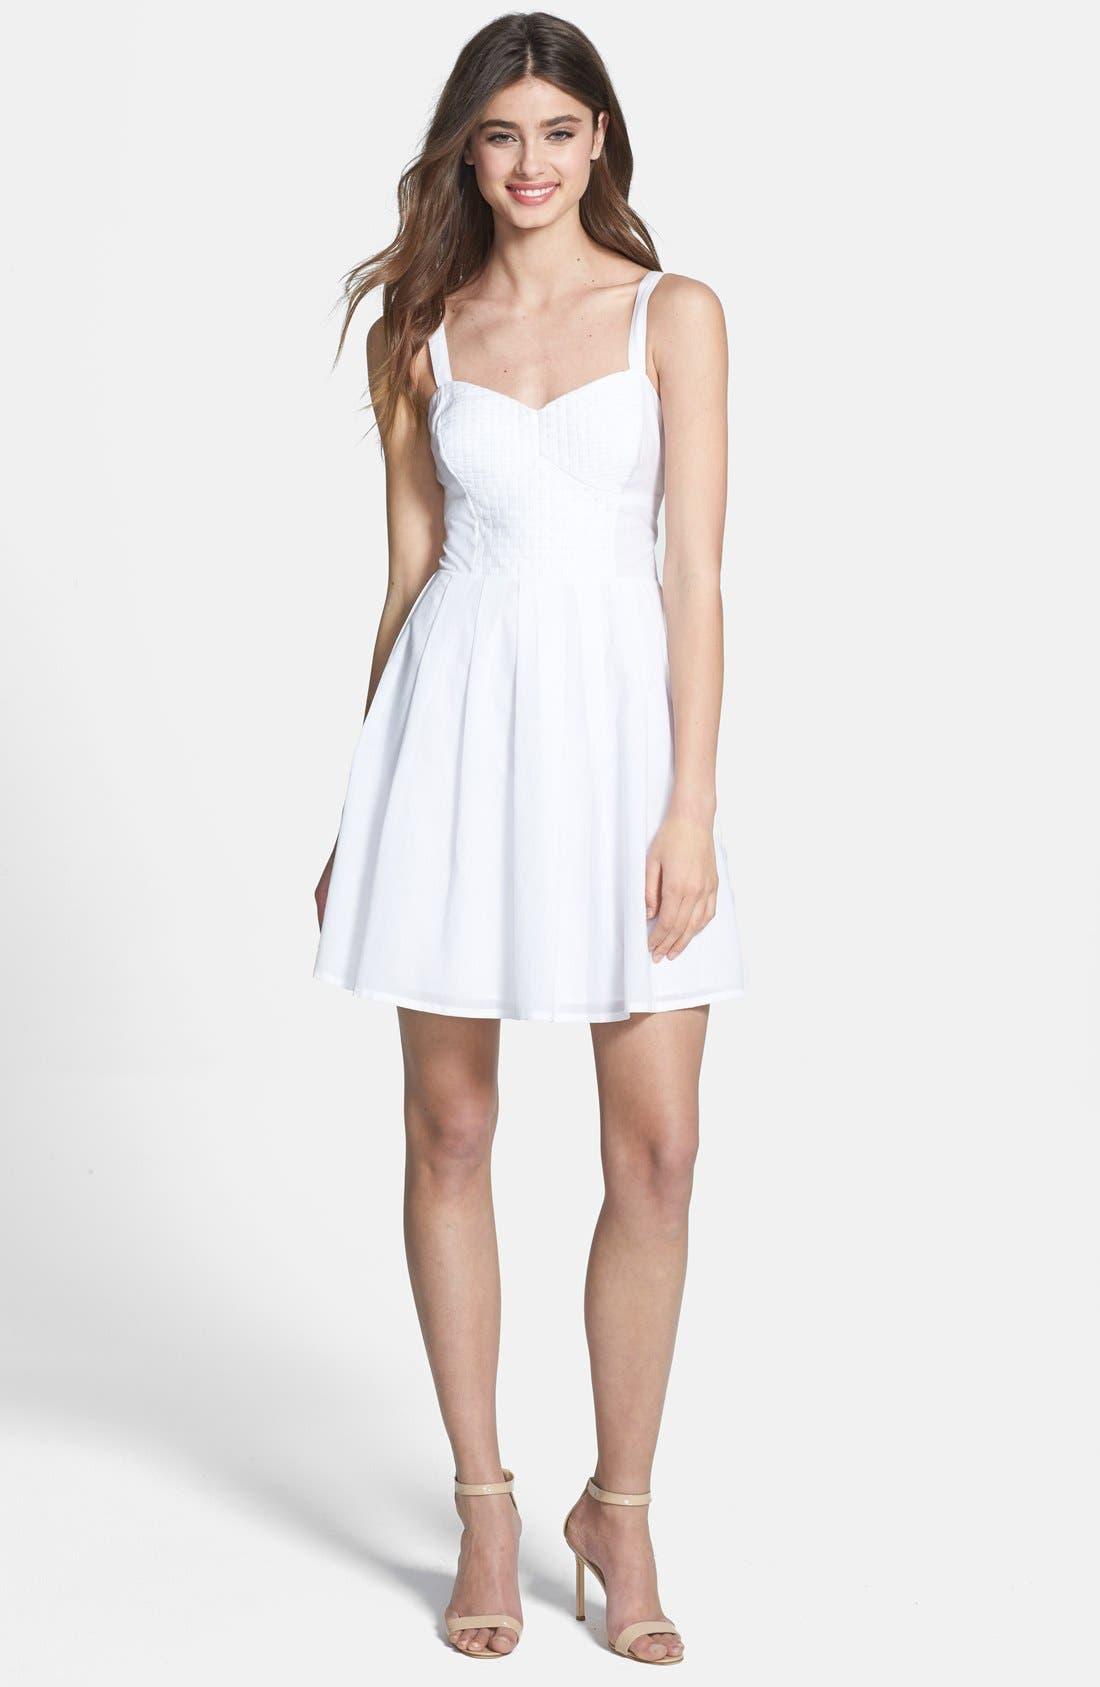 Main Image - French Connection 'Monaco Breeze' Cotton Fit & Flare Dress